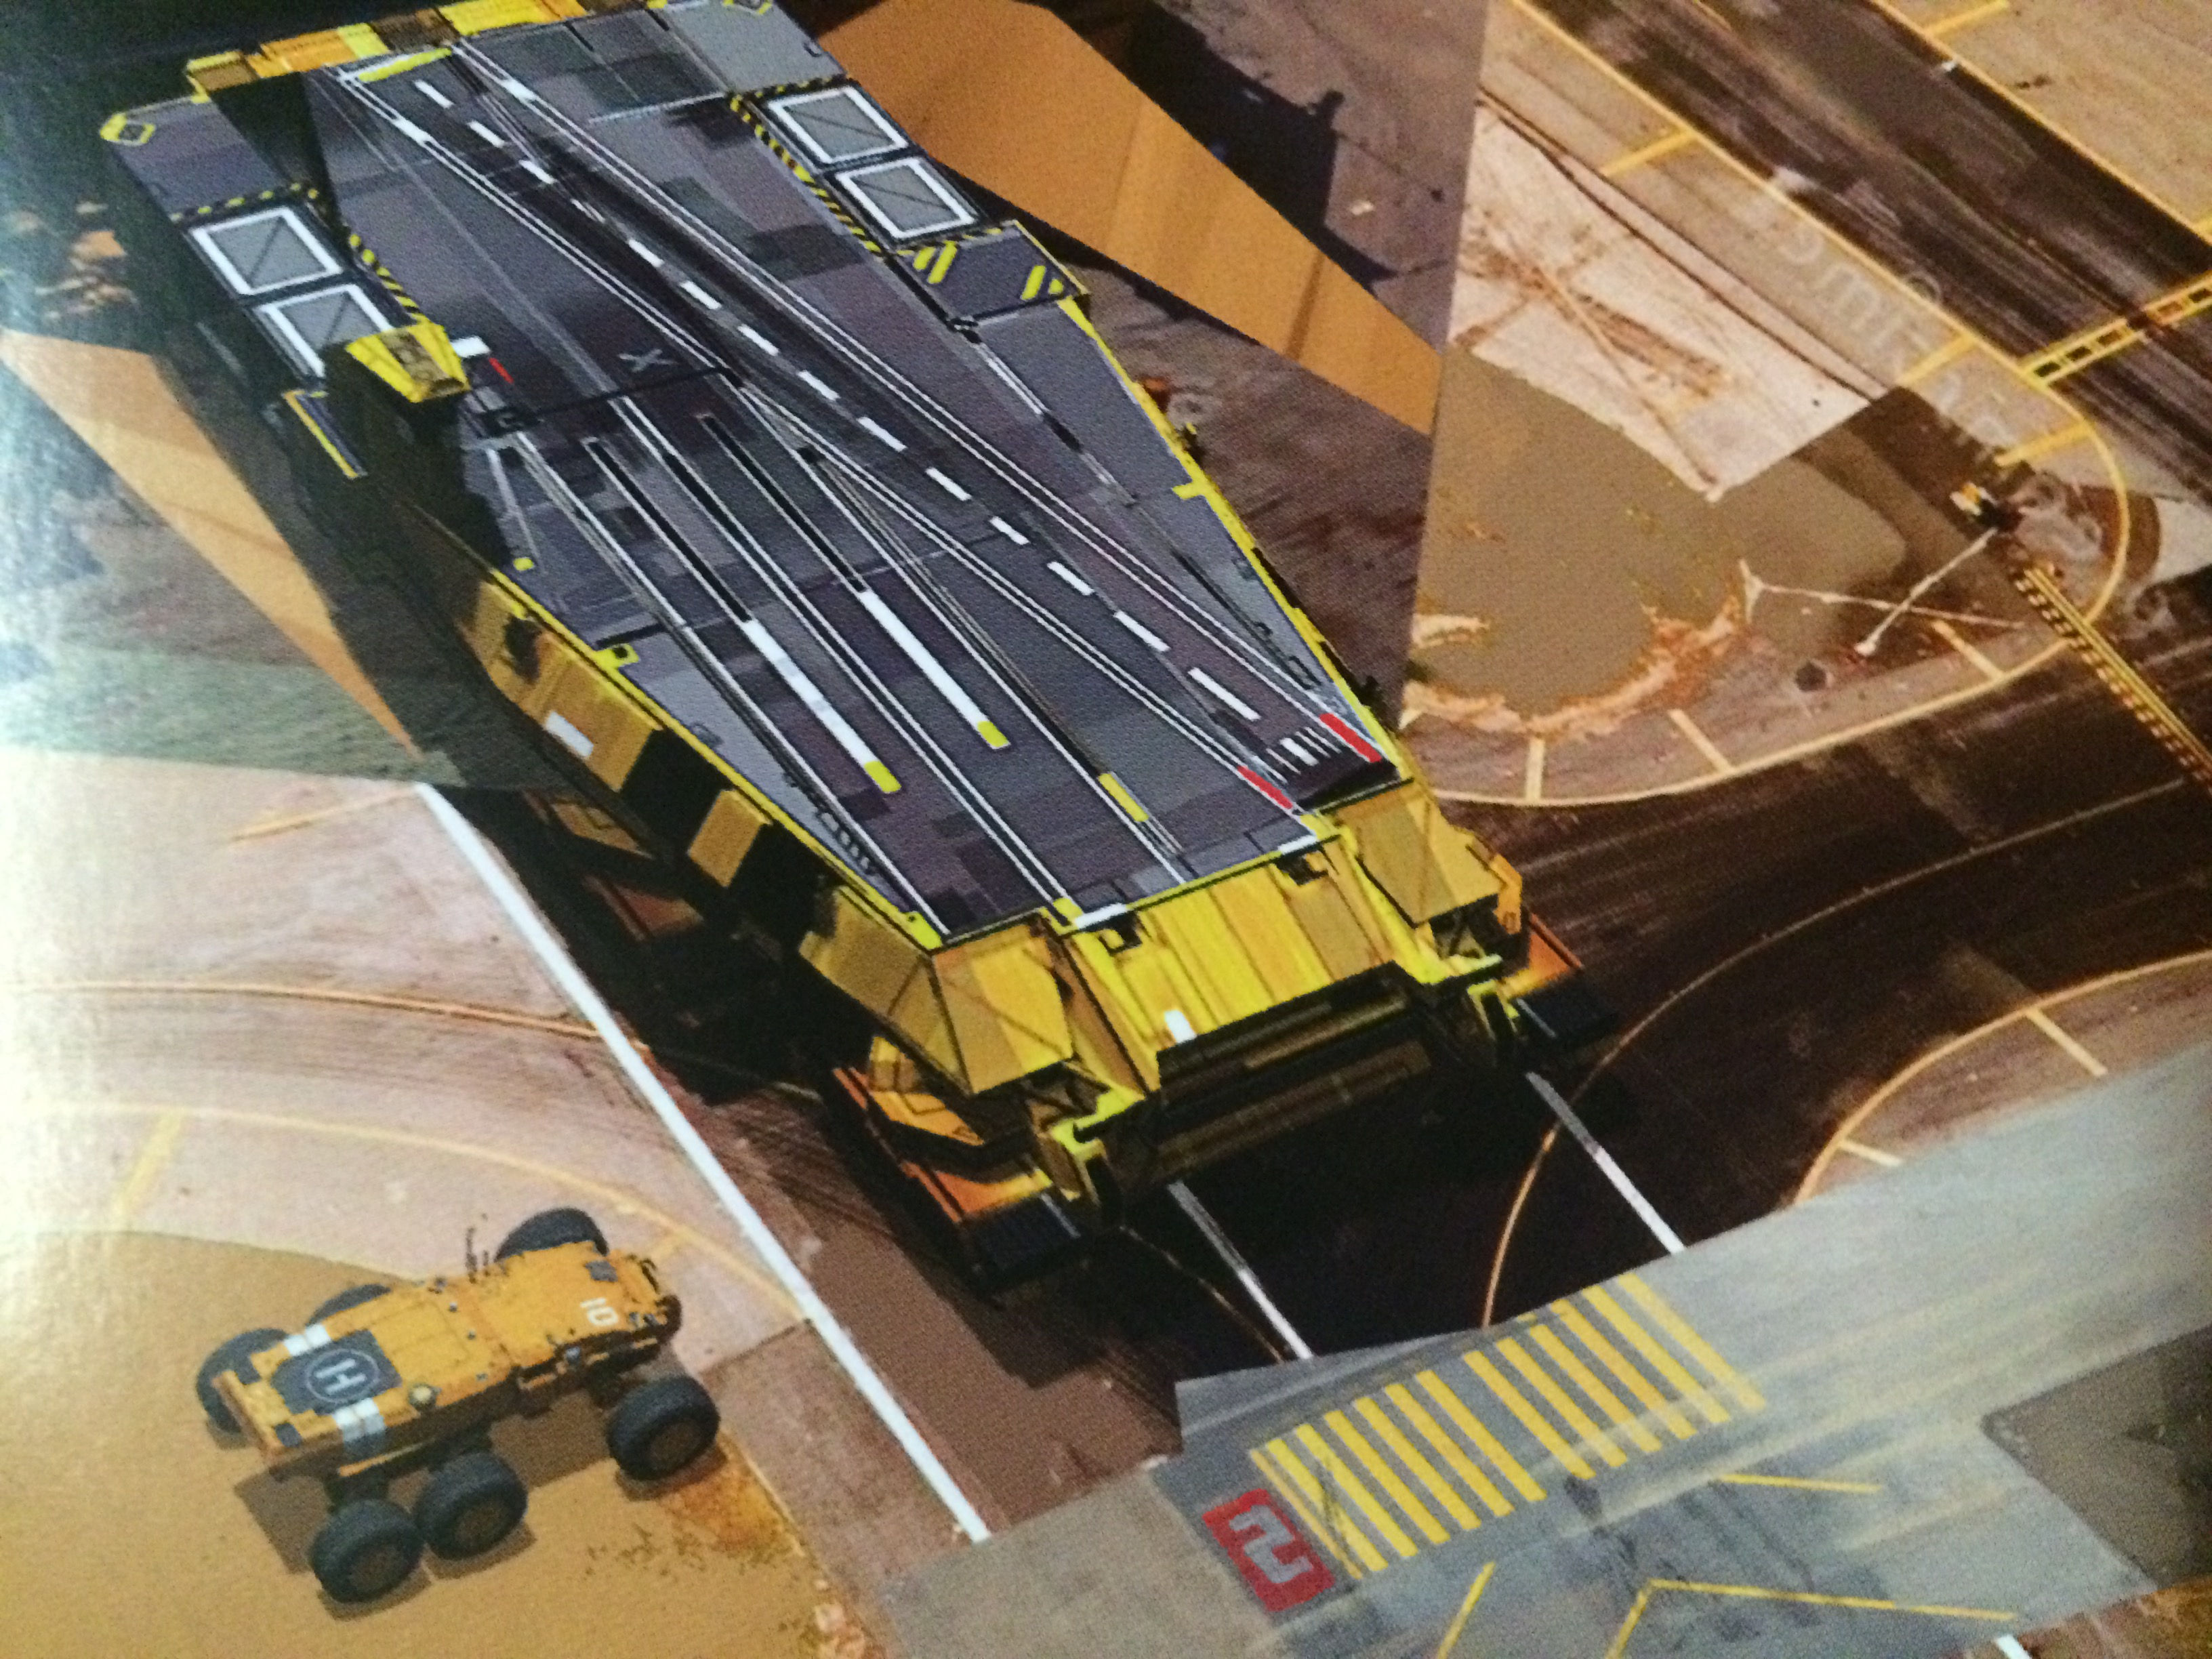 Homeworld Deserts of Kharak Collector's Edition Concept Art - Baserunner and Coalition Carrier